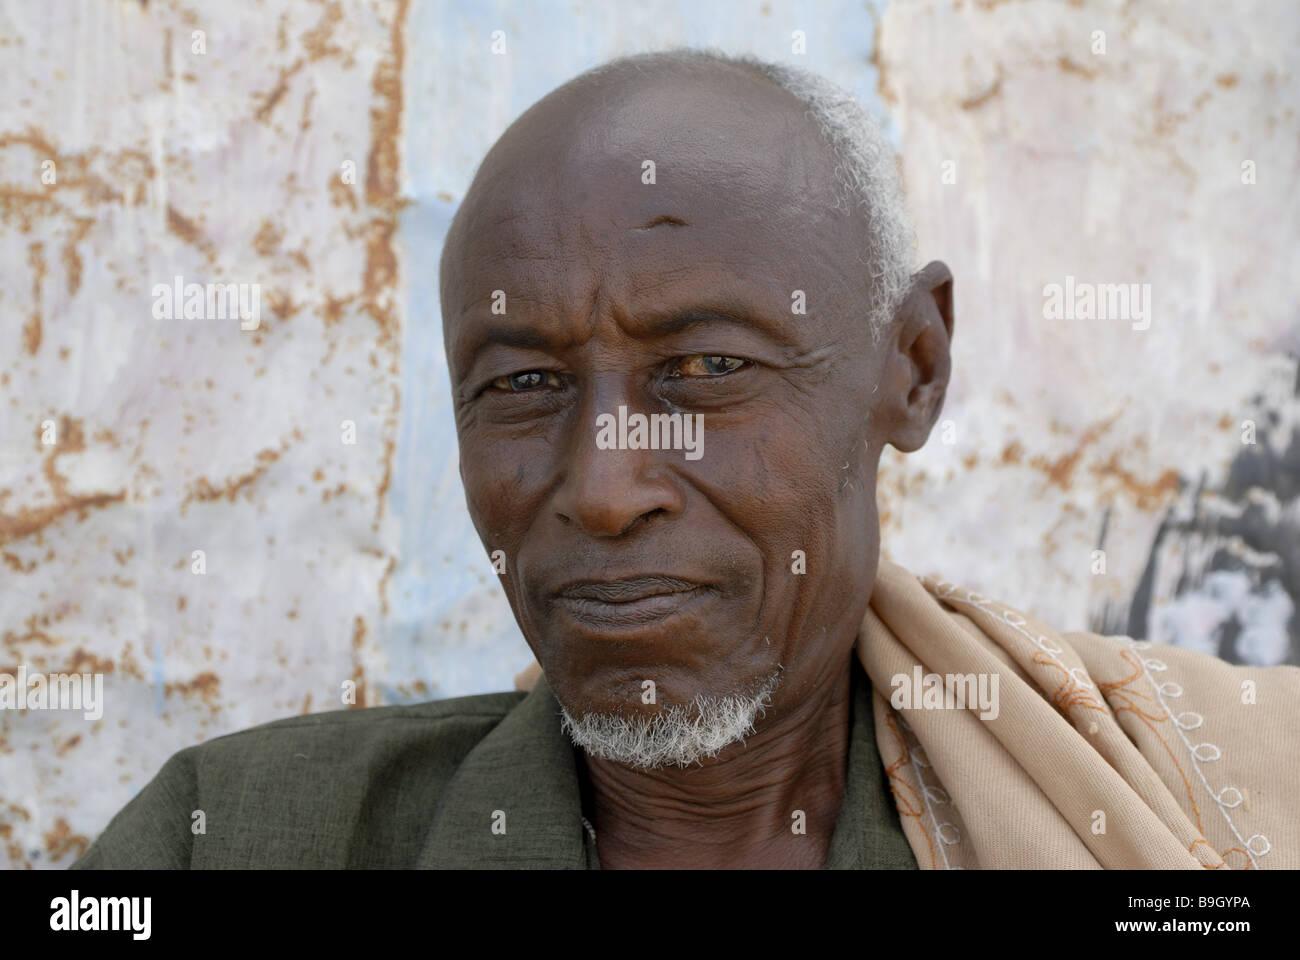 Native africans photos 33